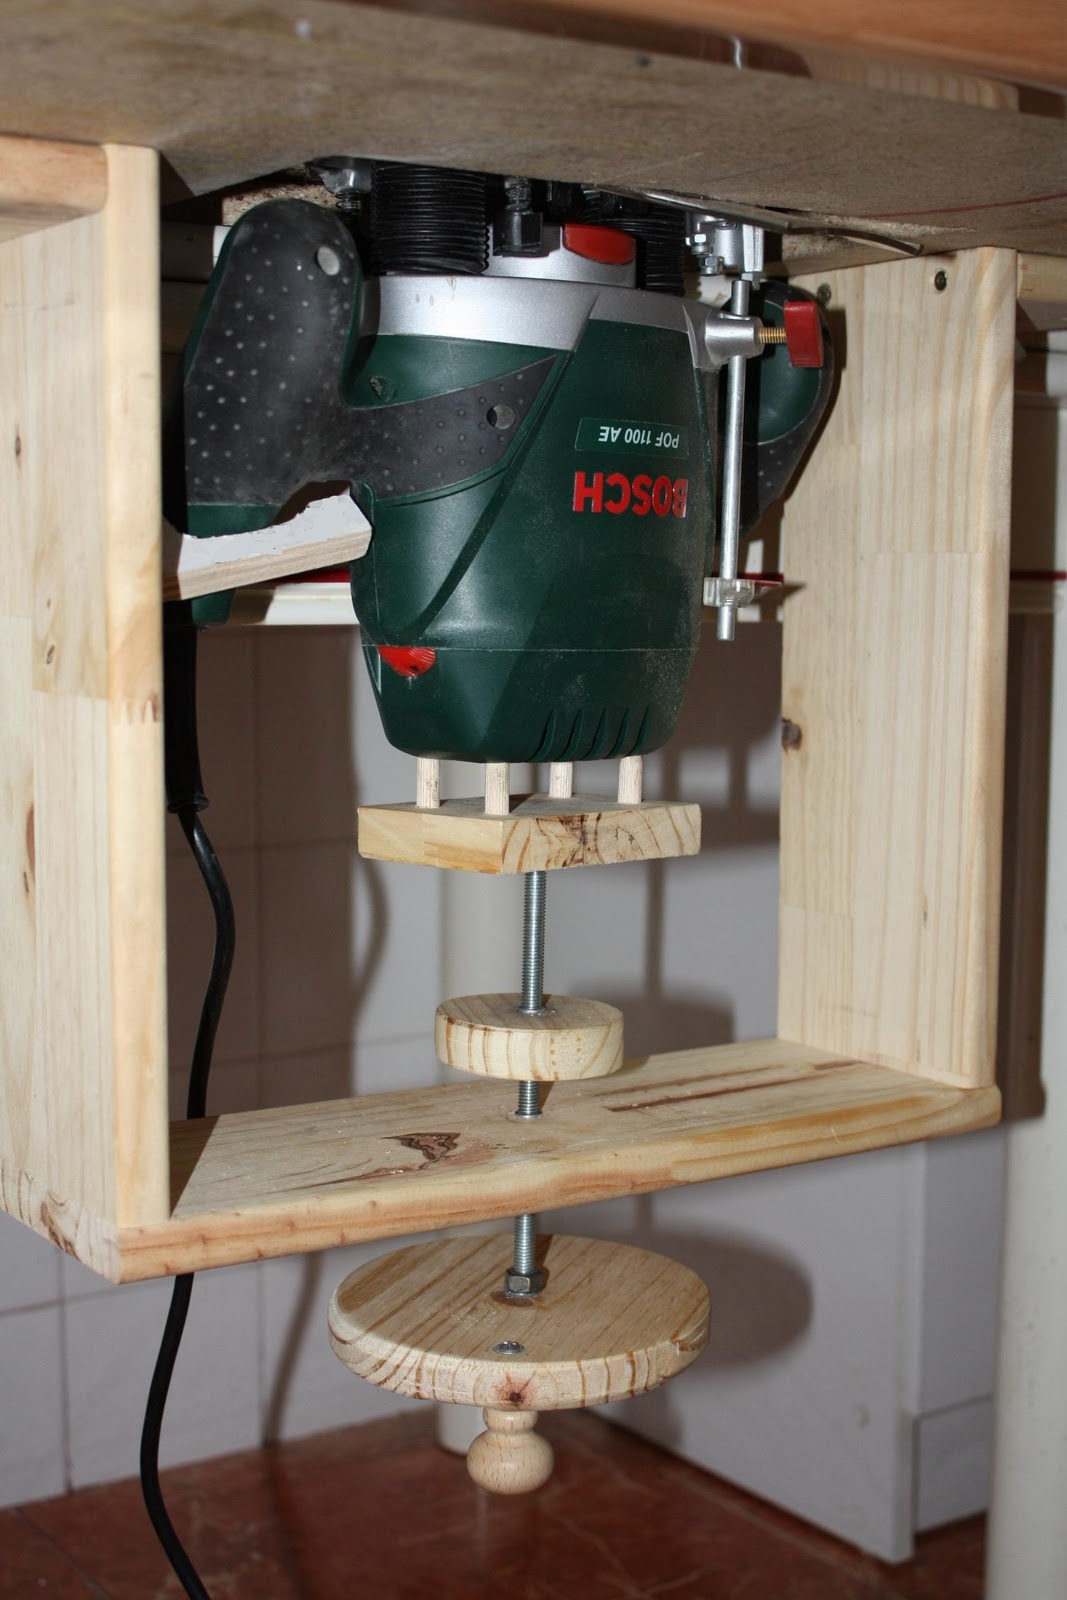 Brico carpinteria mesa para fresadora - Fresadora de madera ...